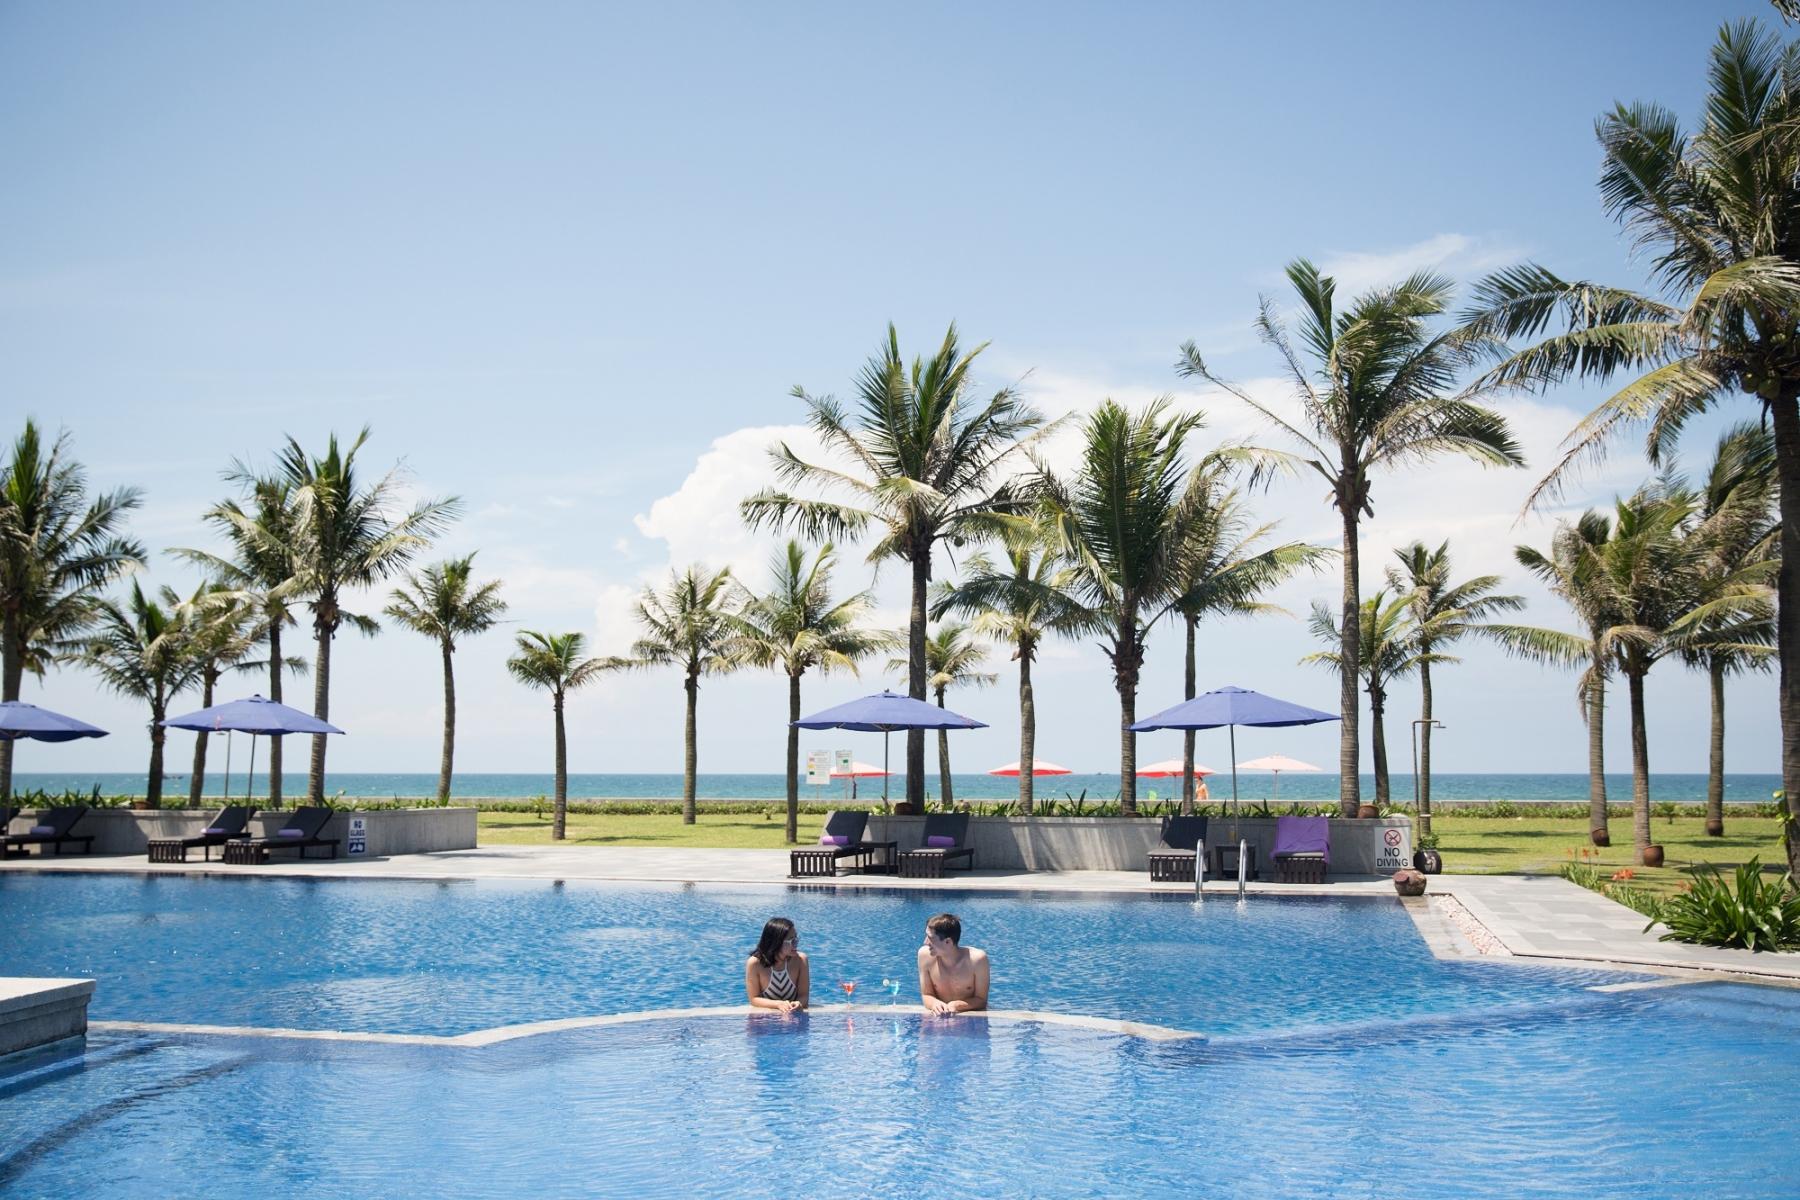 Ảnh: @Ana Mandara Huế Resort & Spa